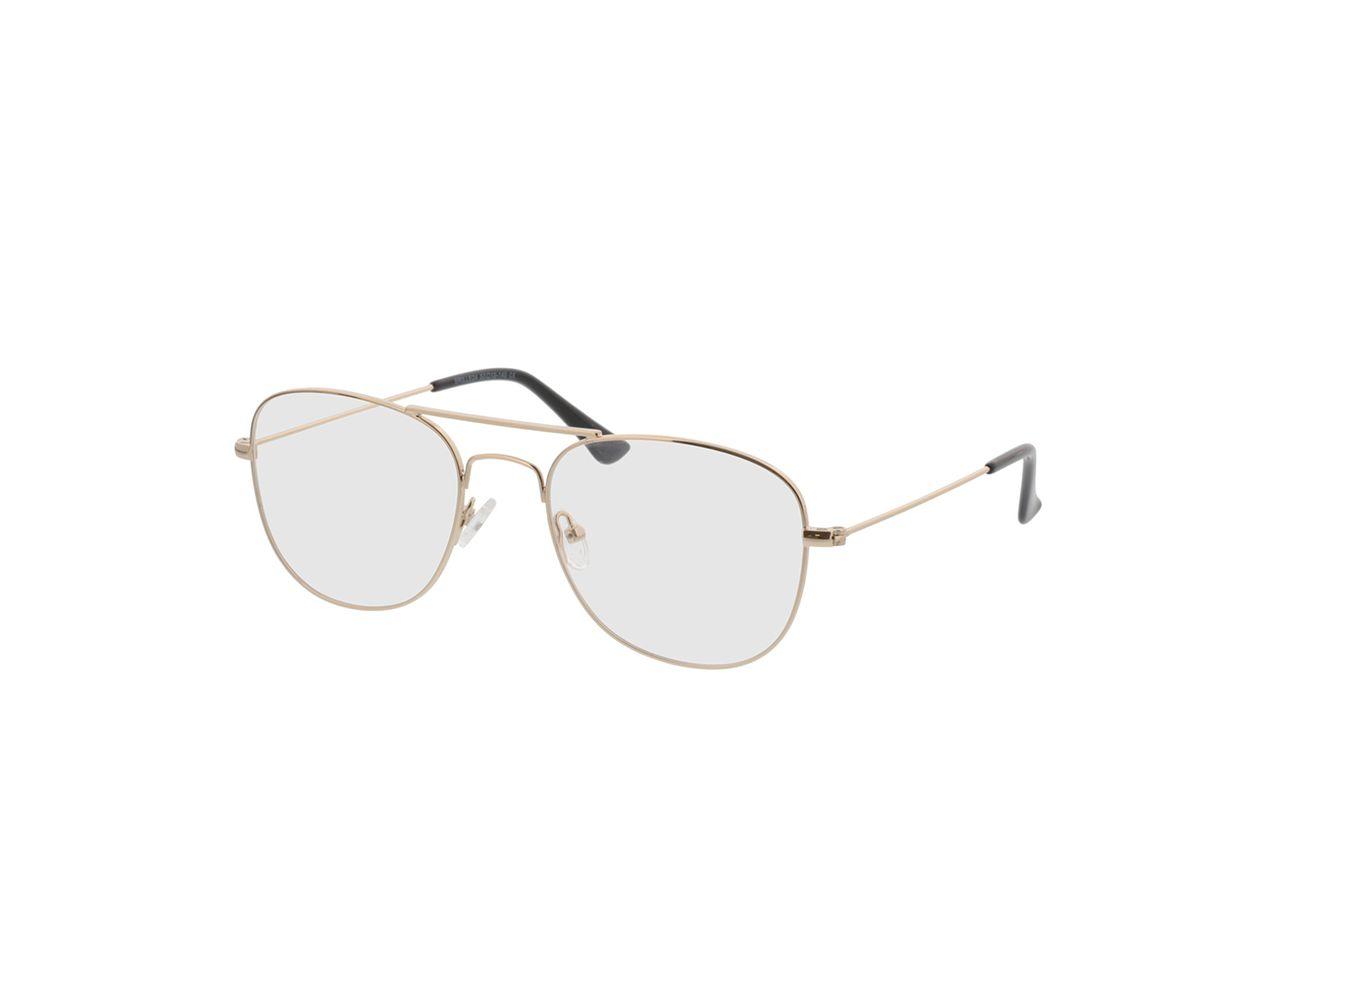 4774-singlevision-0000 Quincy-gold Gleitsichtbrille, Vollrand, Pilot Brille24 Collection